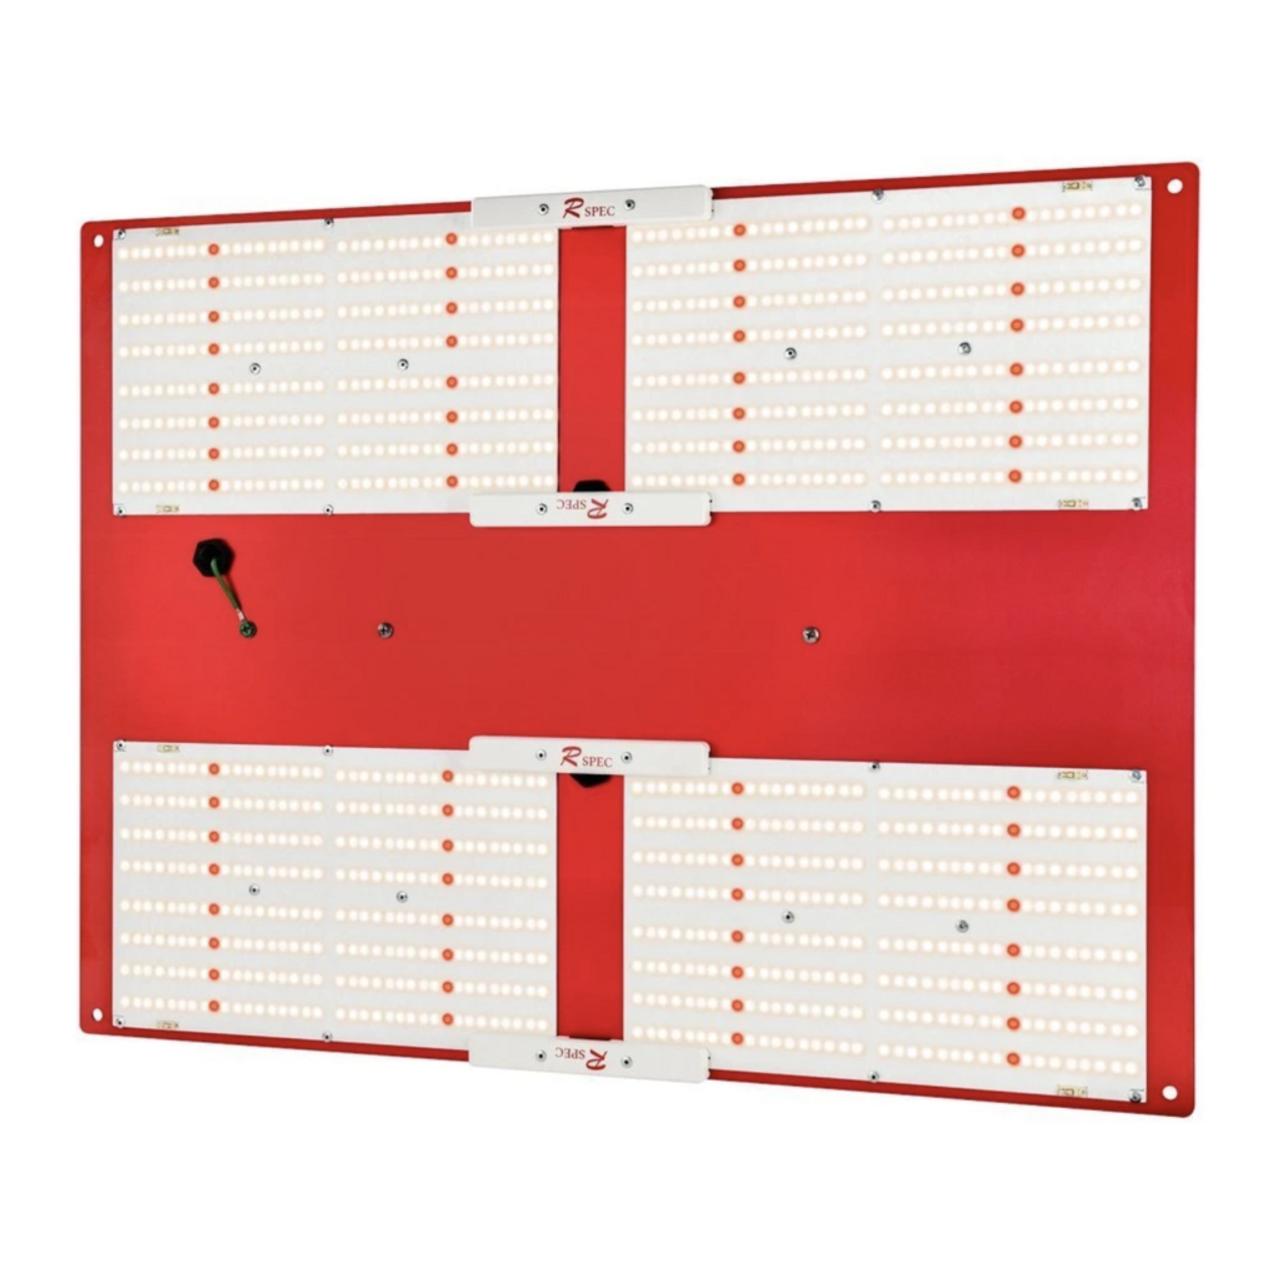 HLG 600 Red Spectrum (Rspec) LED Grow Light   4'x4'